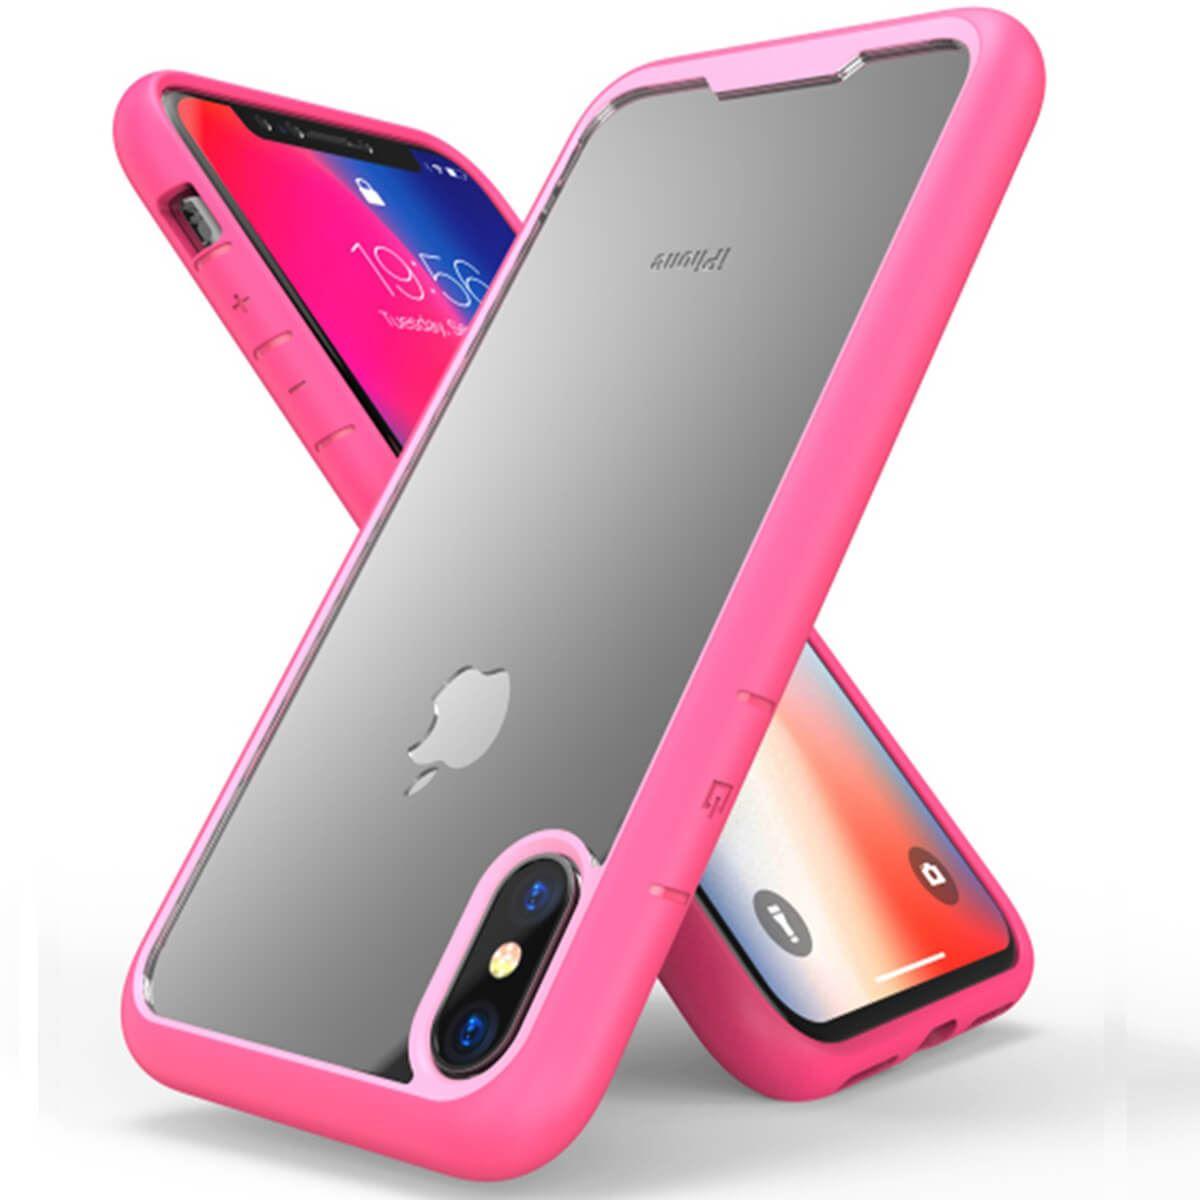 Shockproof-Bumper-Case-For-iPhone-X-XS-XR-6-Plus-7-Plus-6-Plus-Hard-Armor thumbnail 13